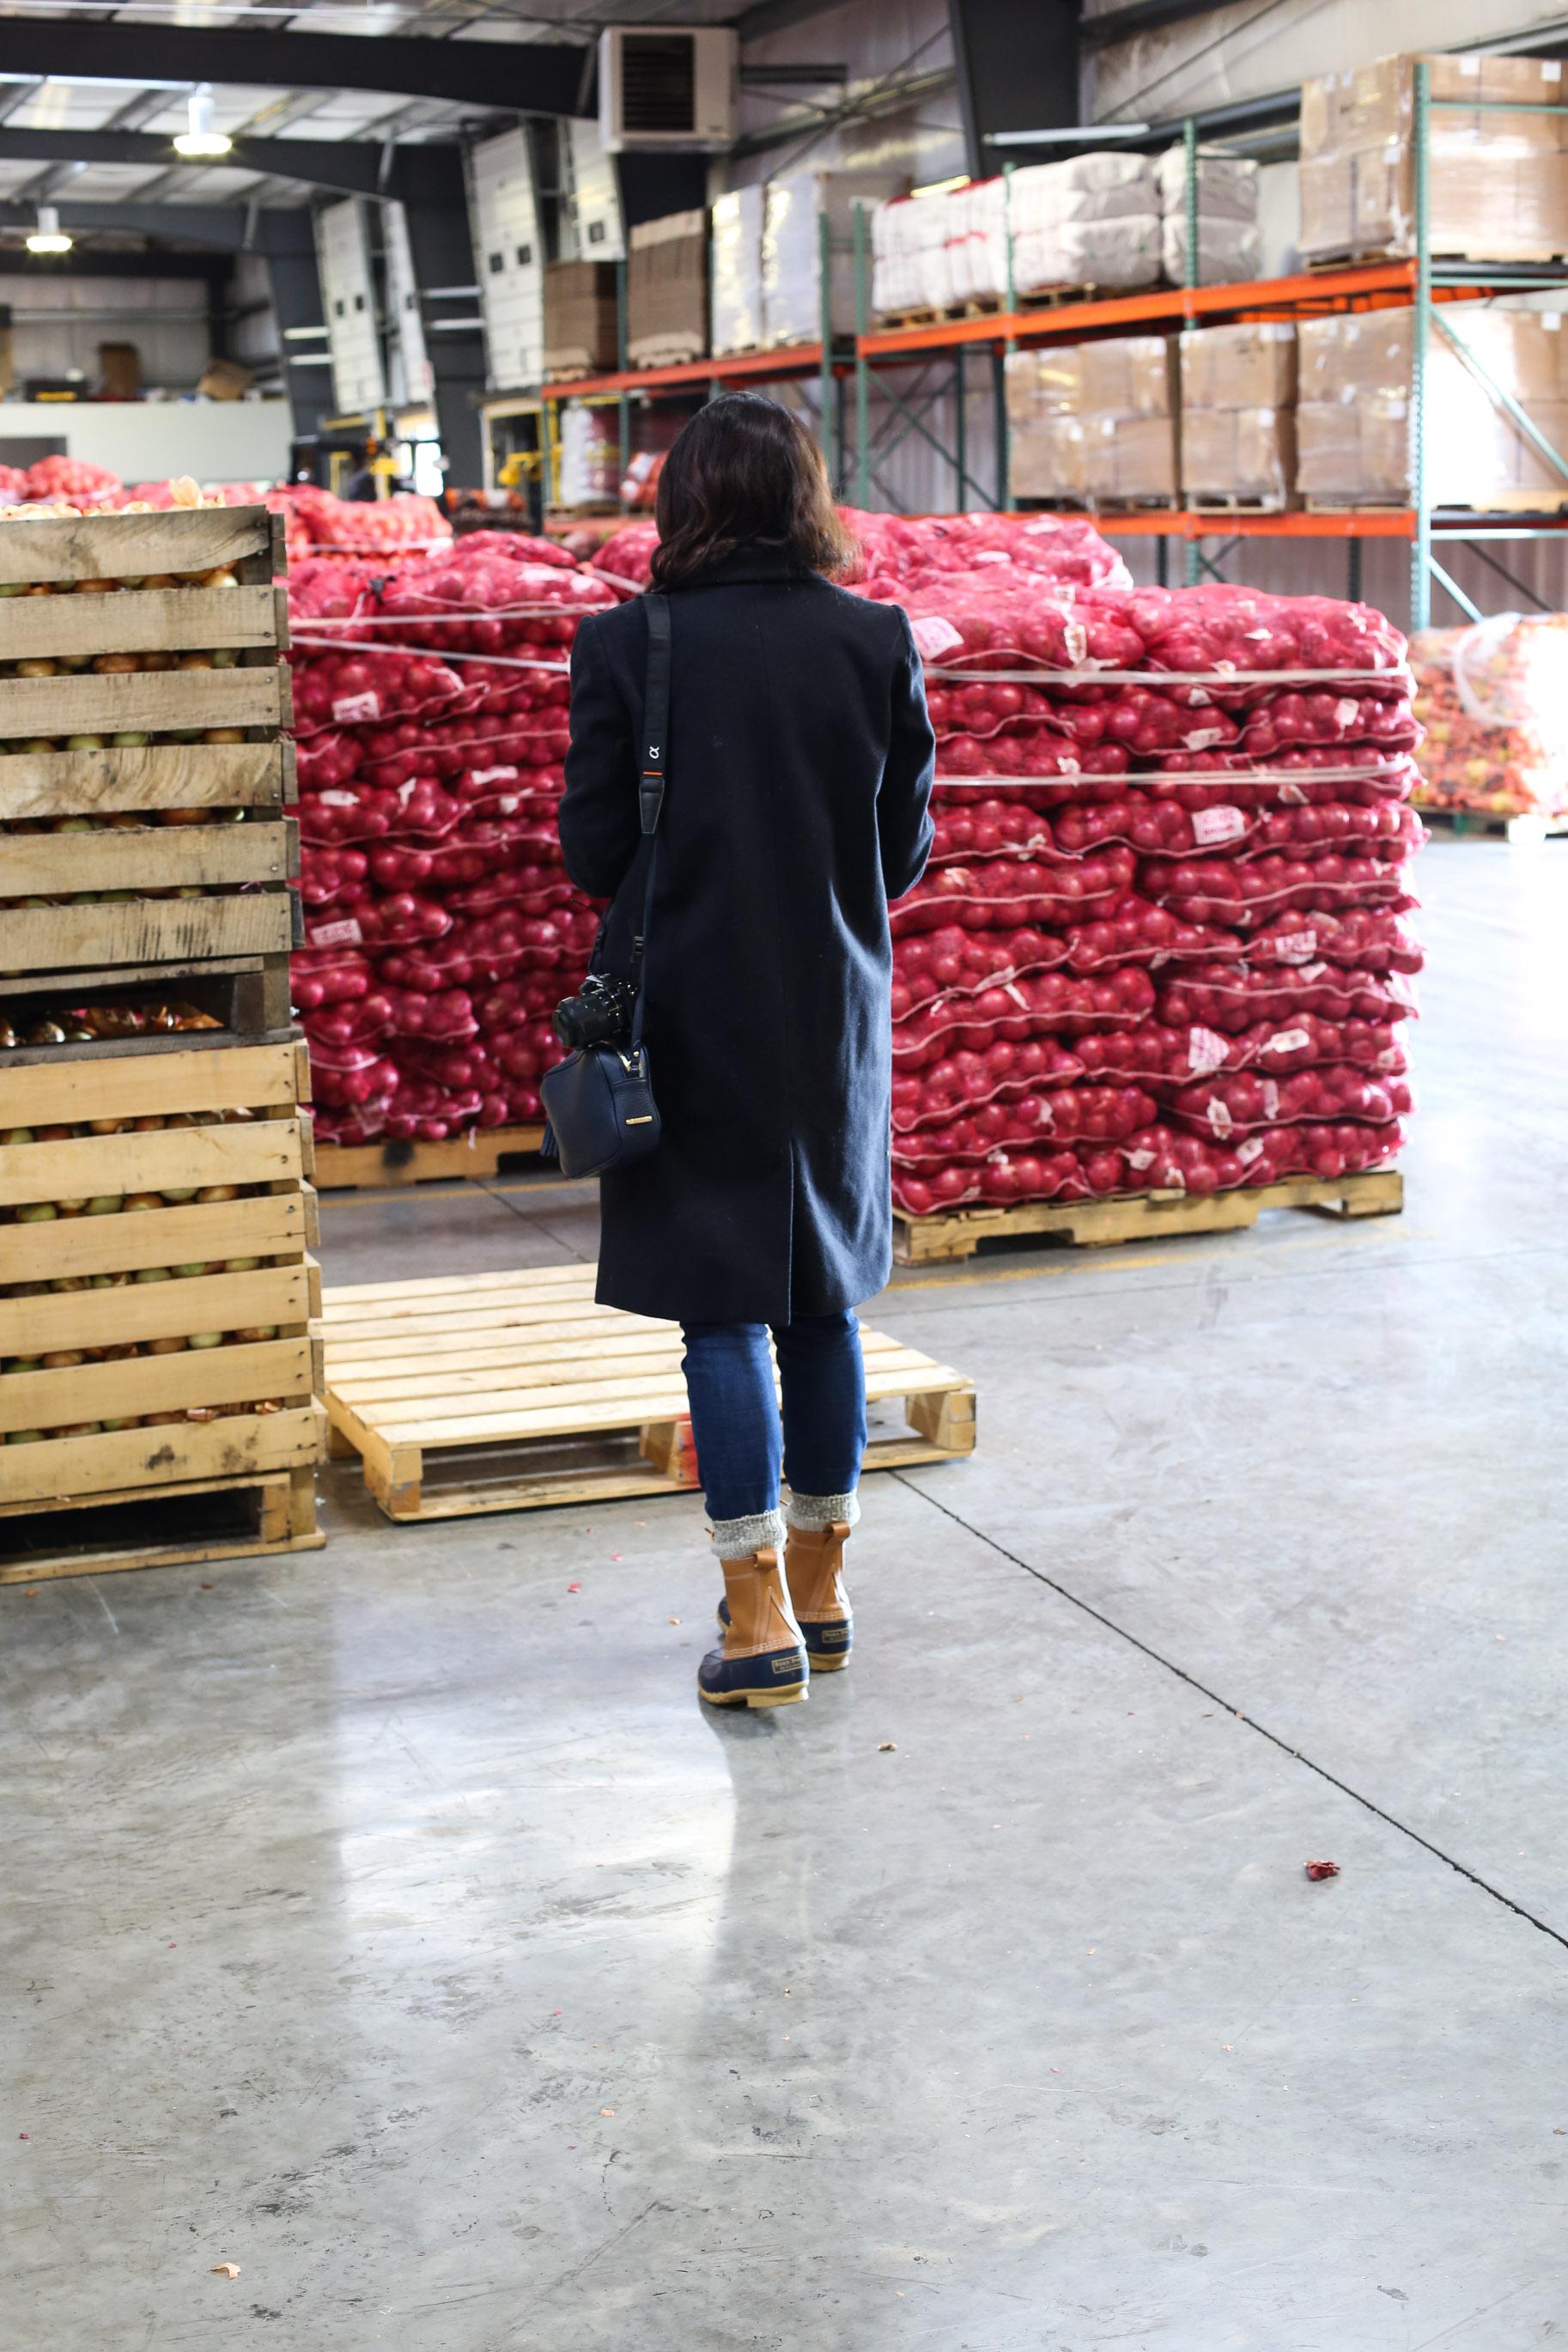 Minkus-Family-Onion-Farm10.jpg